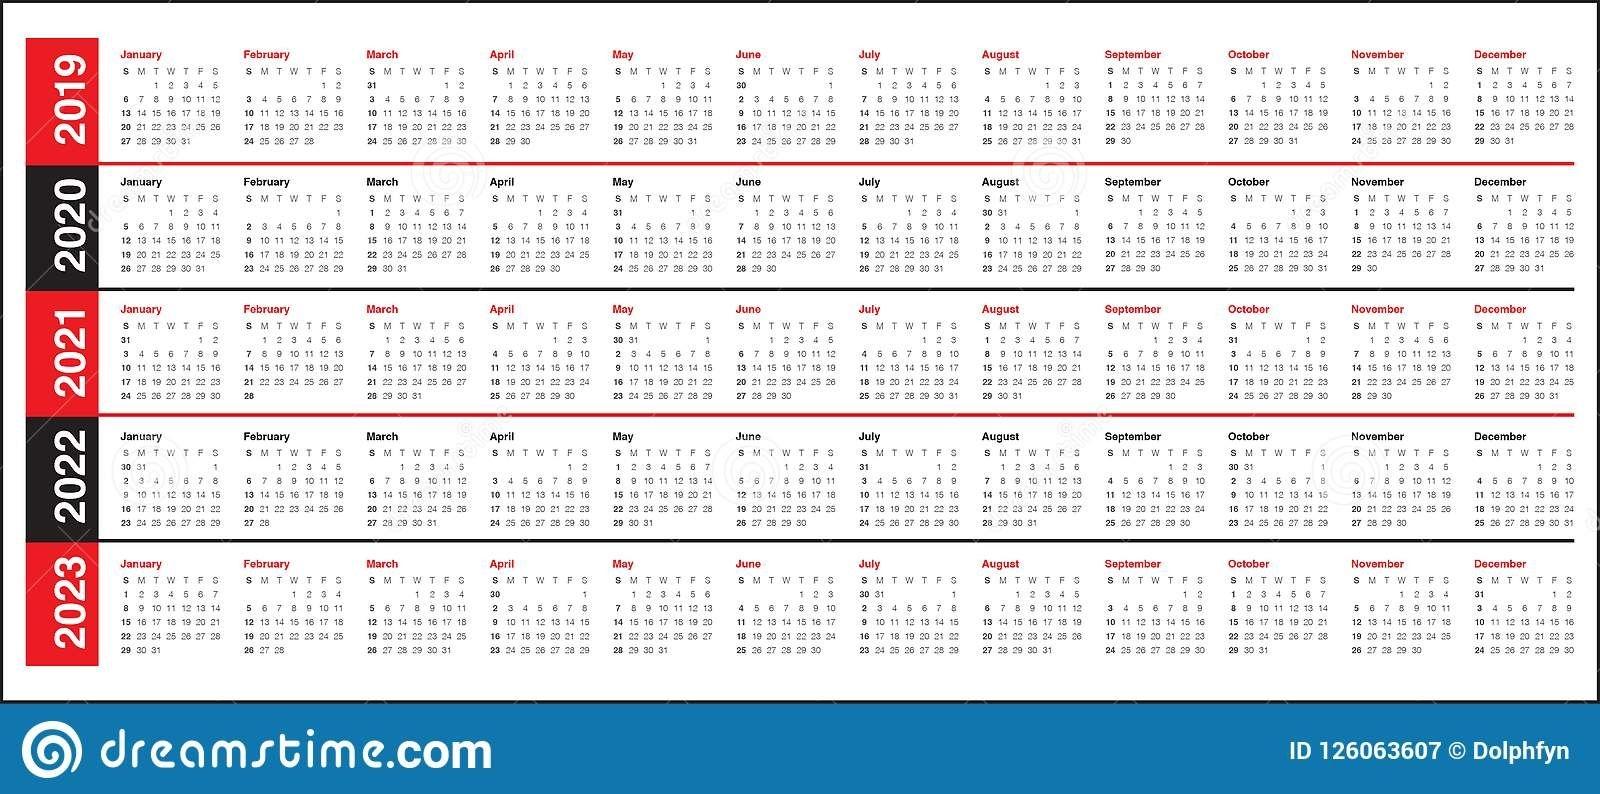 collect three year calendar 2020 2021 2022 | calendar